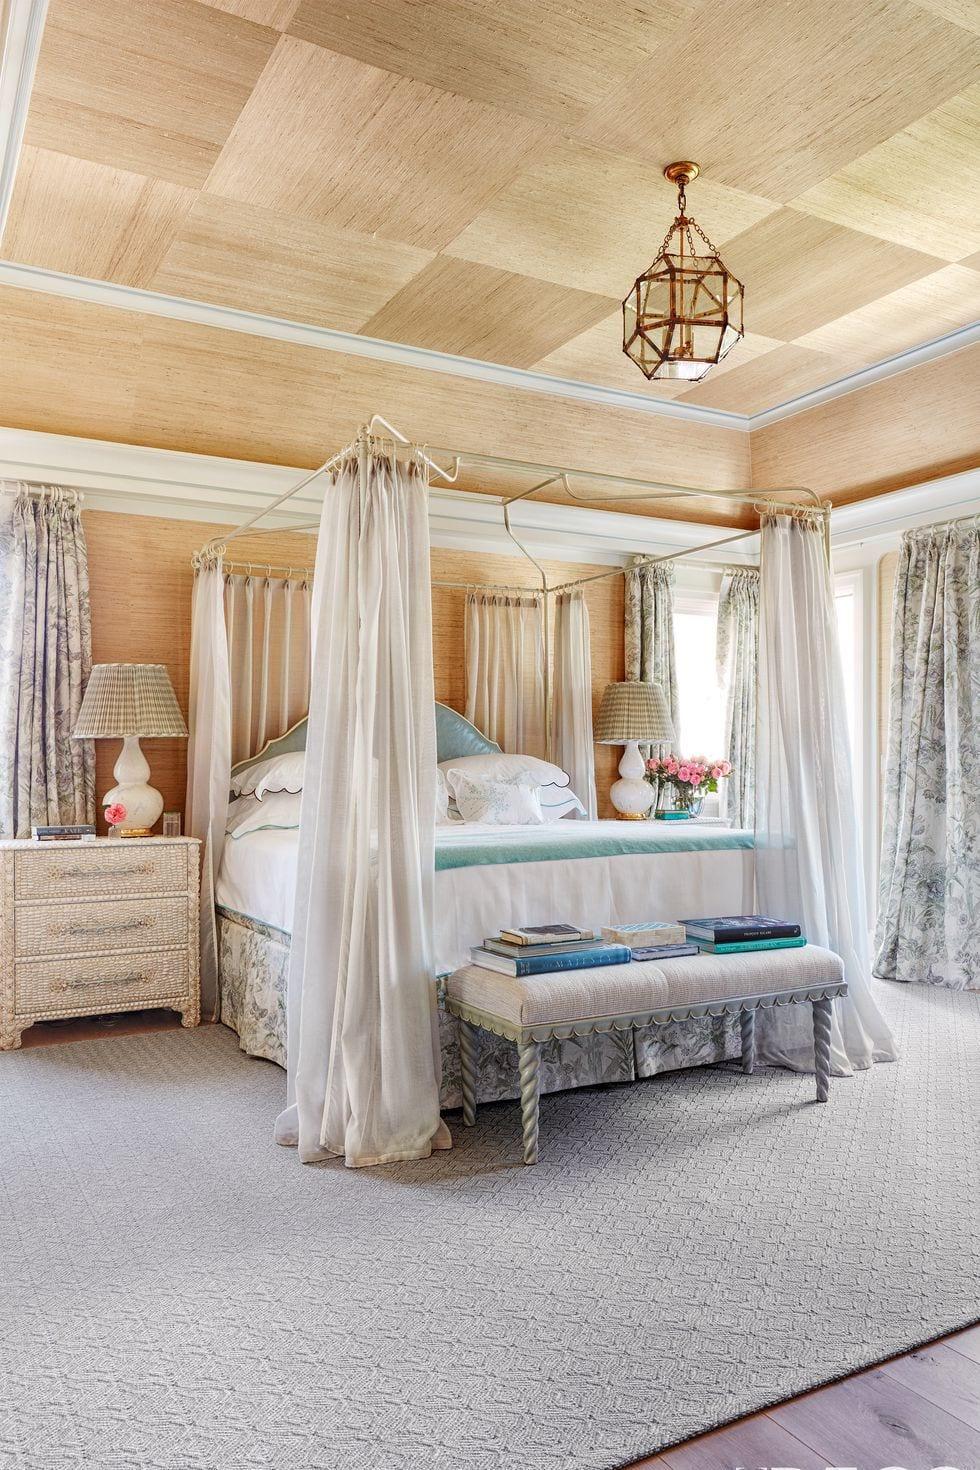 GRASS CLOTH Bedroom Ceiling Design Ideas